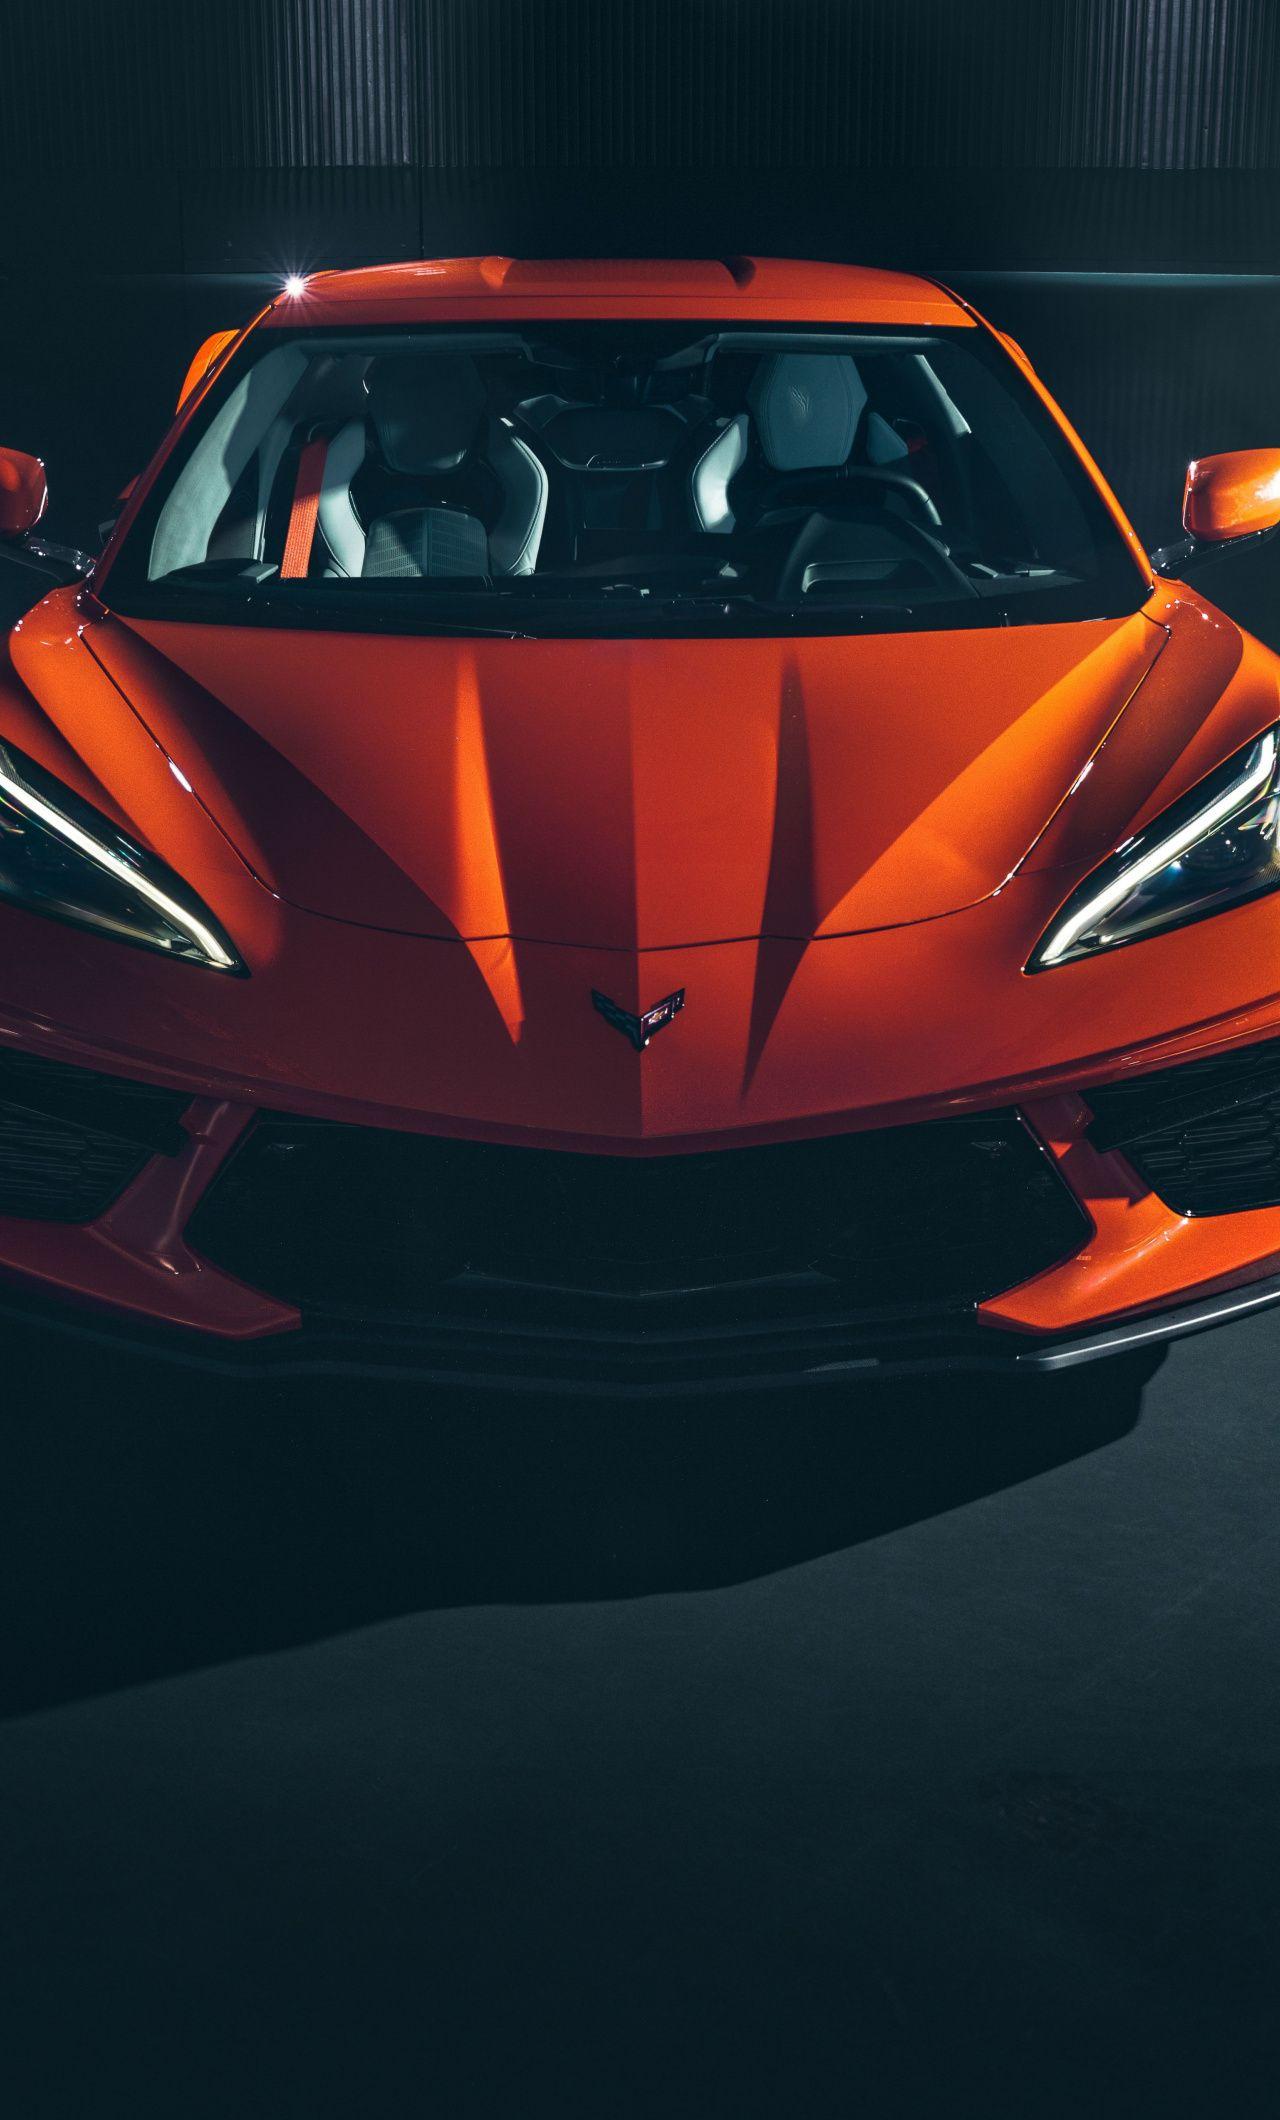 Download 1280x2120 Wallpaper 2020 Chevrolet Corvette Stingray C8 Sports Car Iphone 6 Plus 1 Corvette Stingray Chevrolet Corvette Stingray Chevrolet Corvette